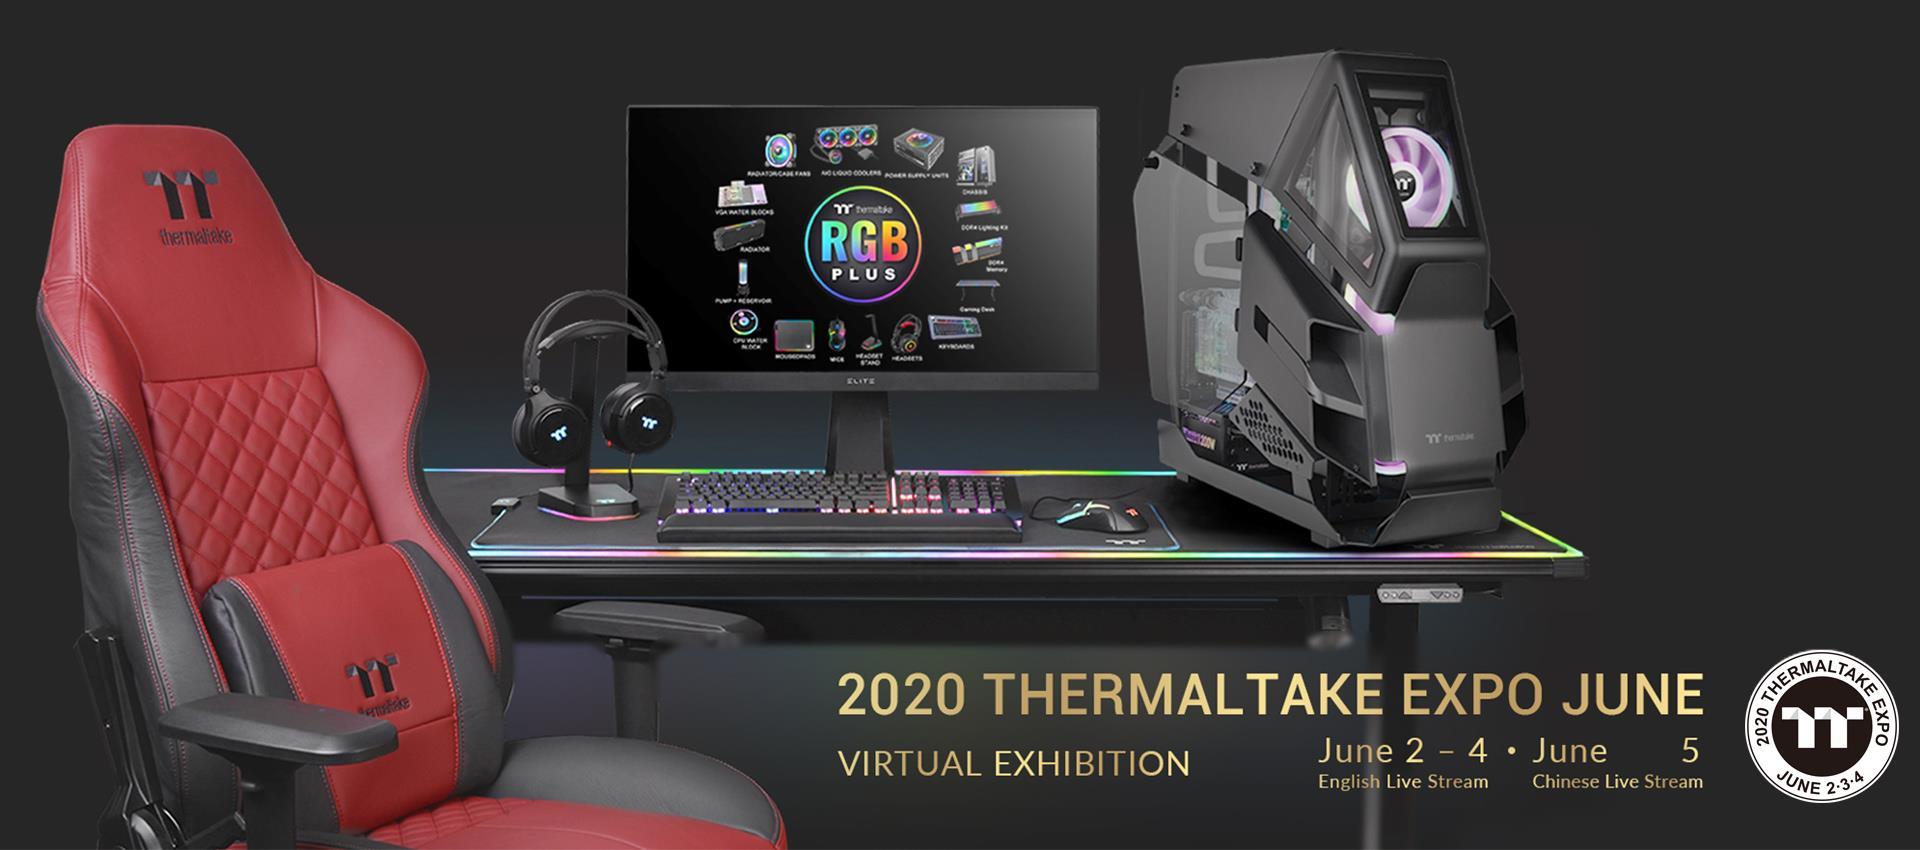 Thermaltake Expo – Day 1 News